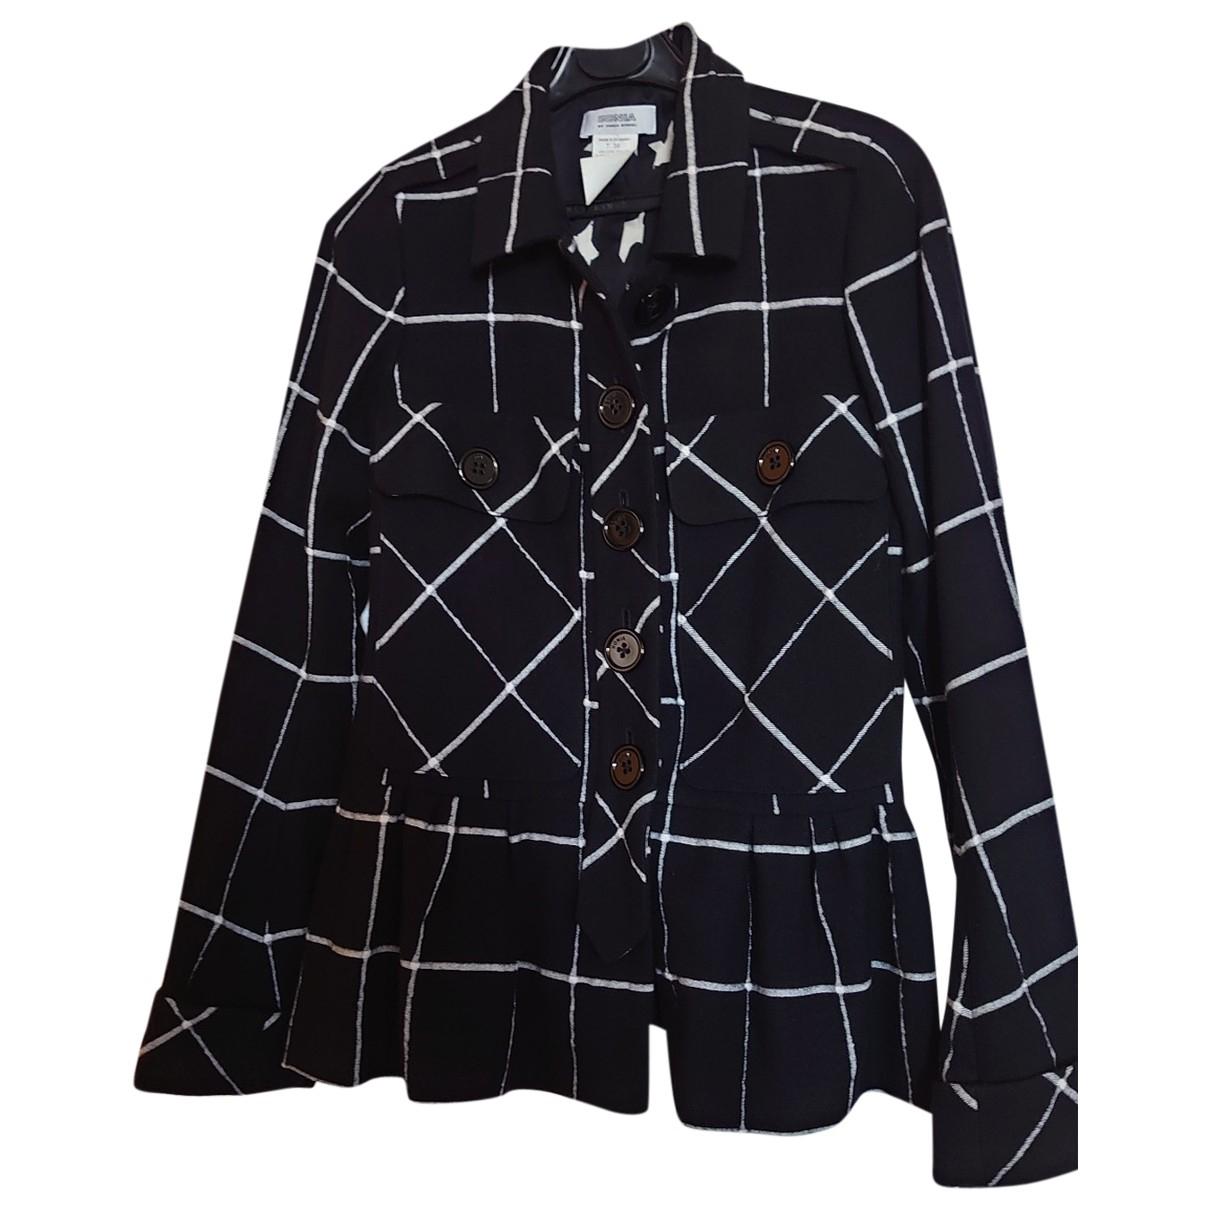 Sonia By Sonia Rykiel \N Black Wool jacket for Women 38 FR